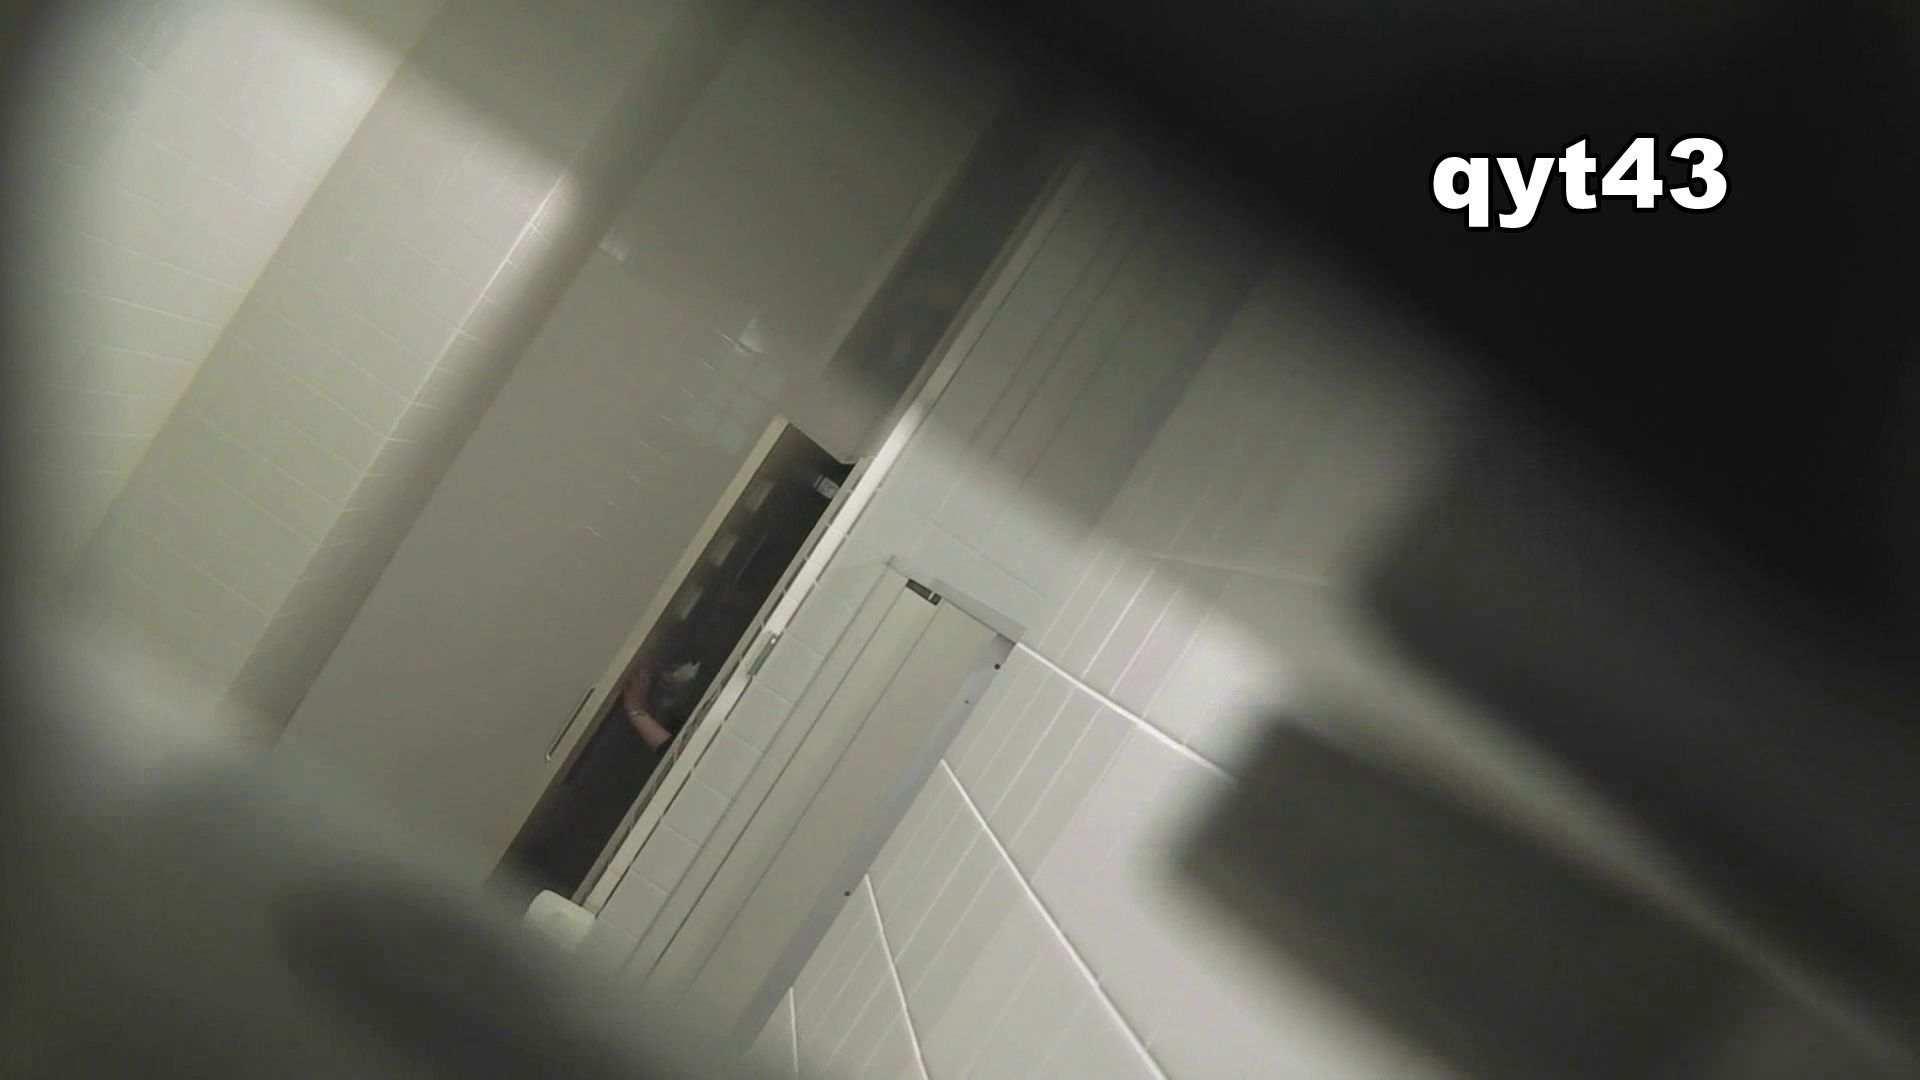 vol.42 命がけ潜伏洗面所! ちょろっとさん 洗面所 | 独身エッチOL  72pic 38